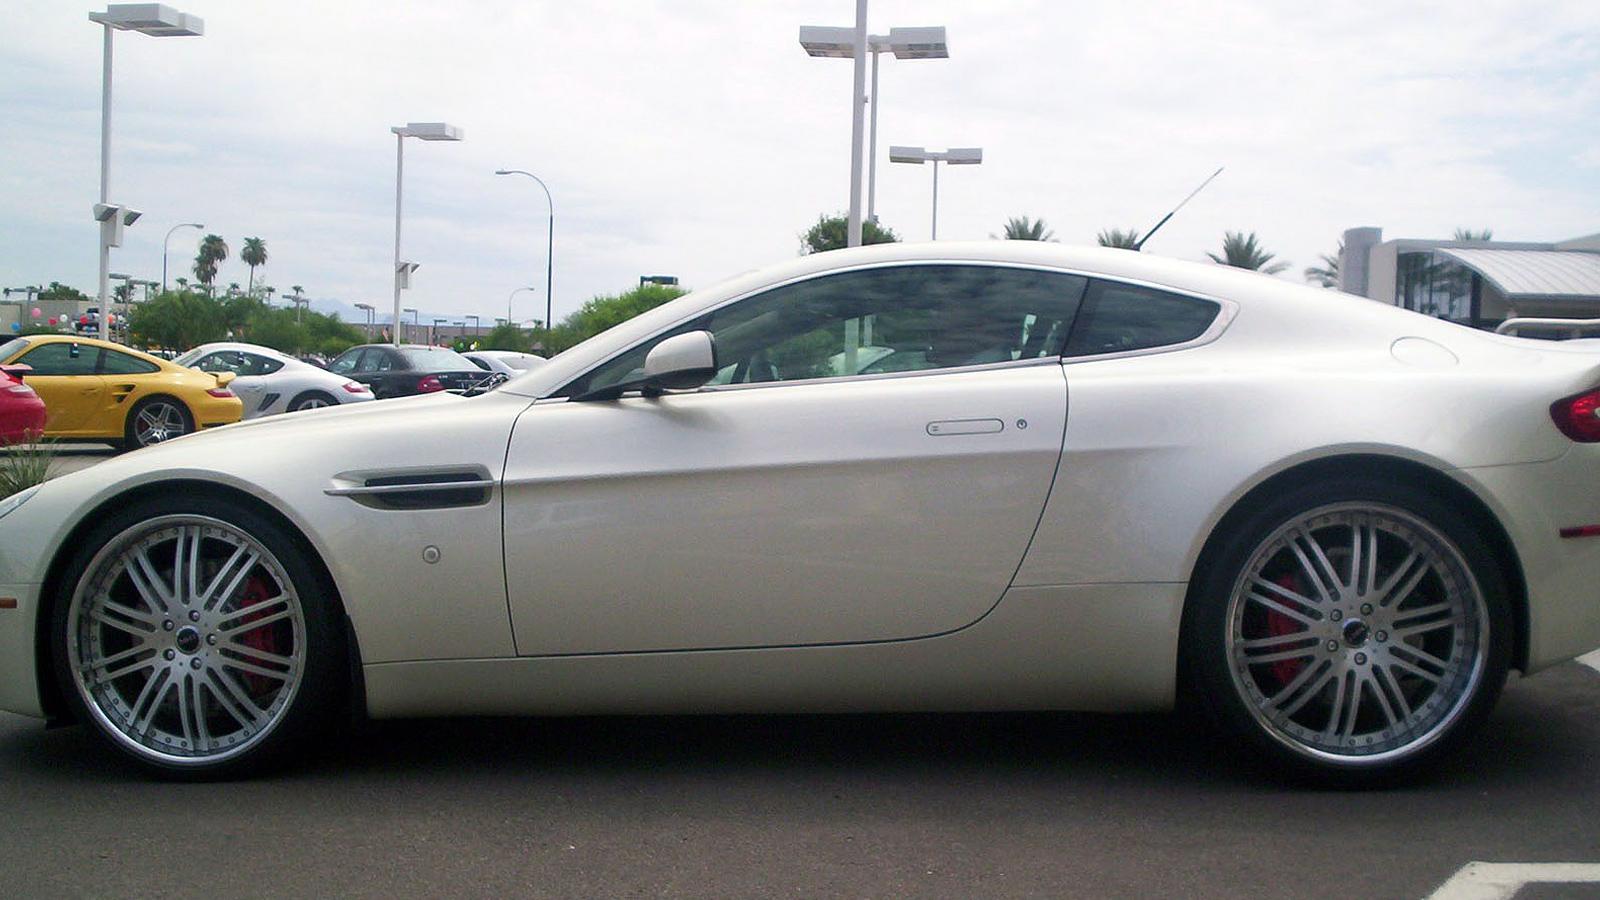 Aston Martin Db9 Vendetta Gallery Mht Wheels Inc